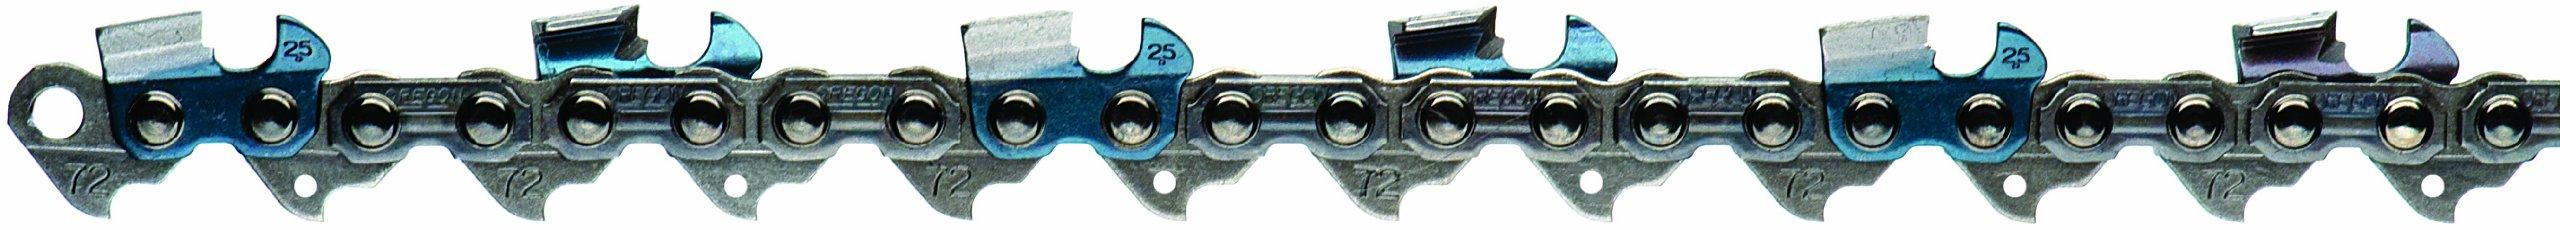 OREGON 72CL100U 100-Feet Reel of Super Guard Semi-Chisel Chain, 3/8-Inch Pitch